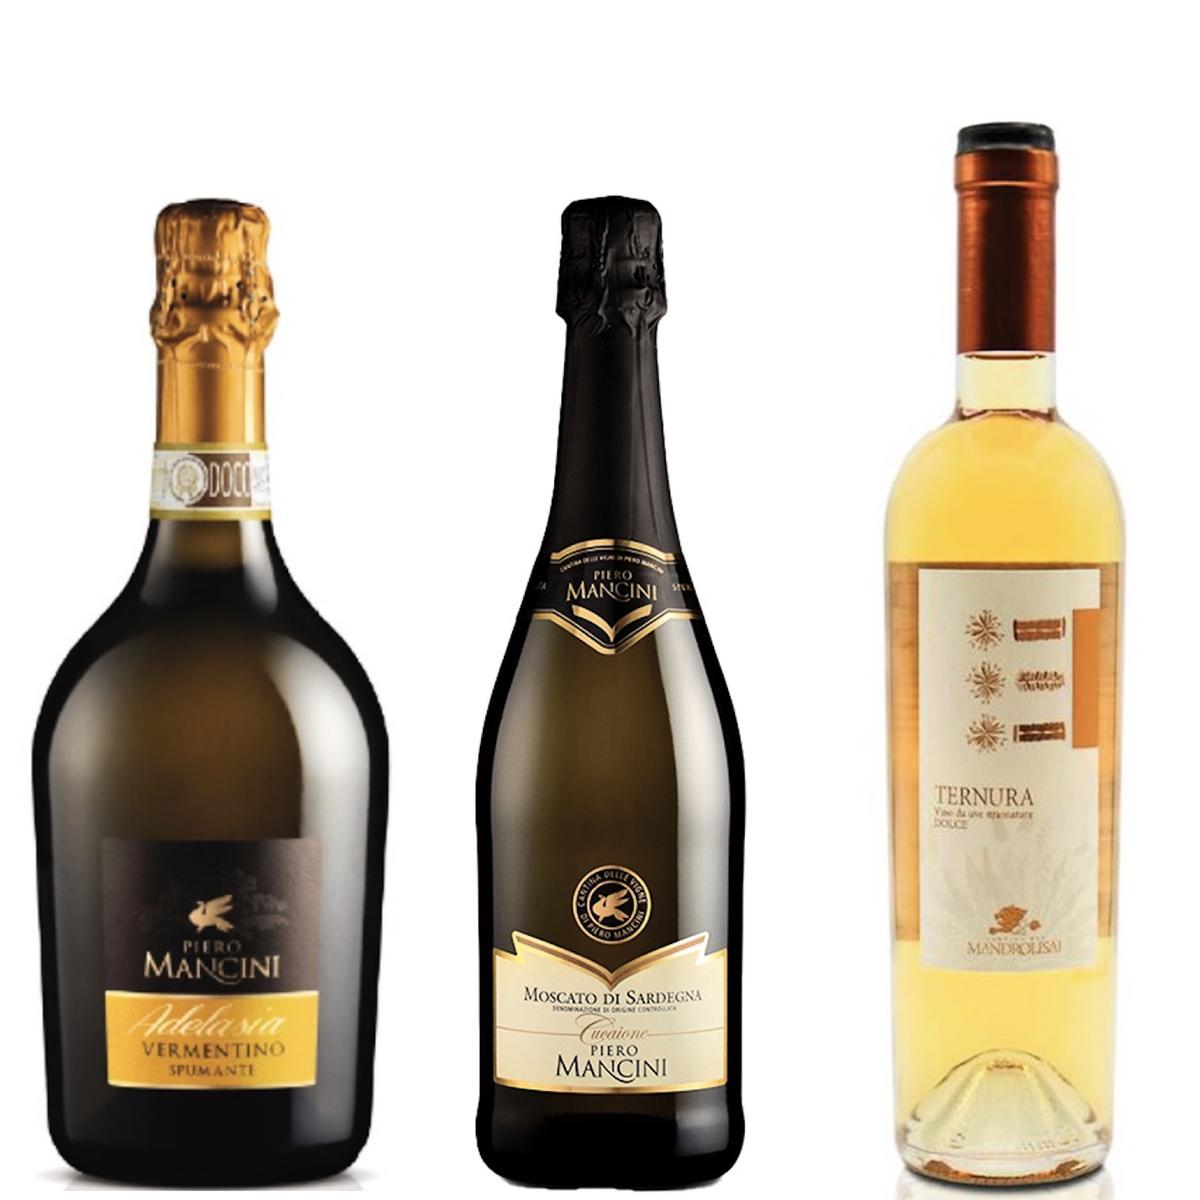 左起:氣泡酒 Piero Mancini Adelasia Spumante Brut($250),甜酒Cantina del Mandrolisai Ternura($330),Piero Mancini Moscato di Sardegna Gallura DOC Spumante($200), 任何3支9折,任何6支8折。